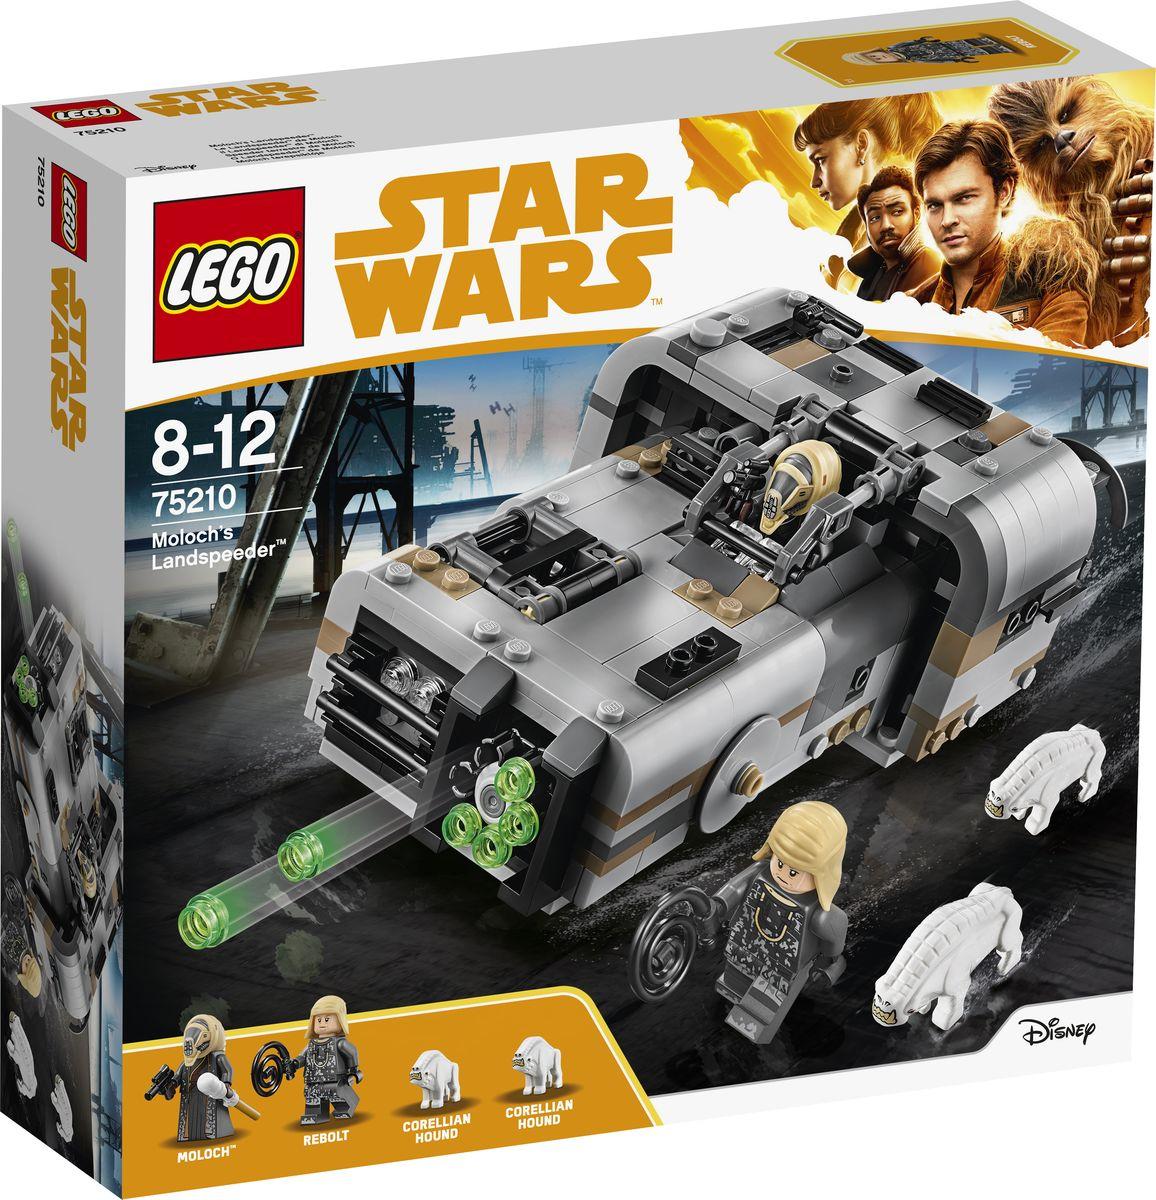 LEGO Star Wars 75210 Спидер Молоха Конструктор